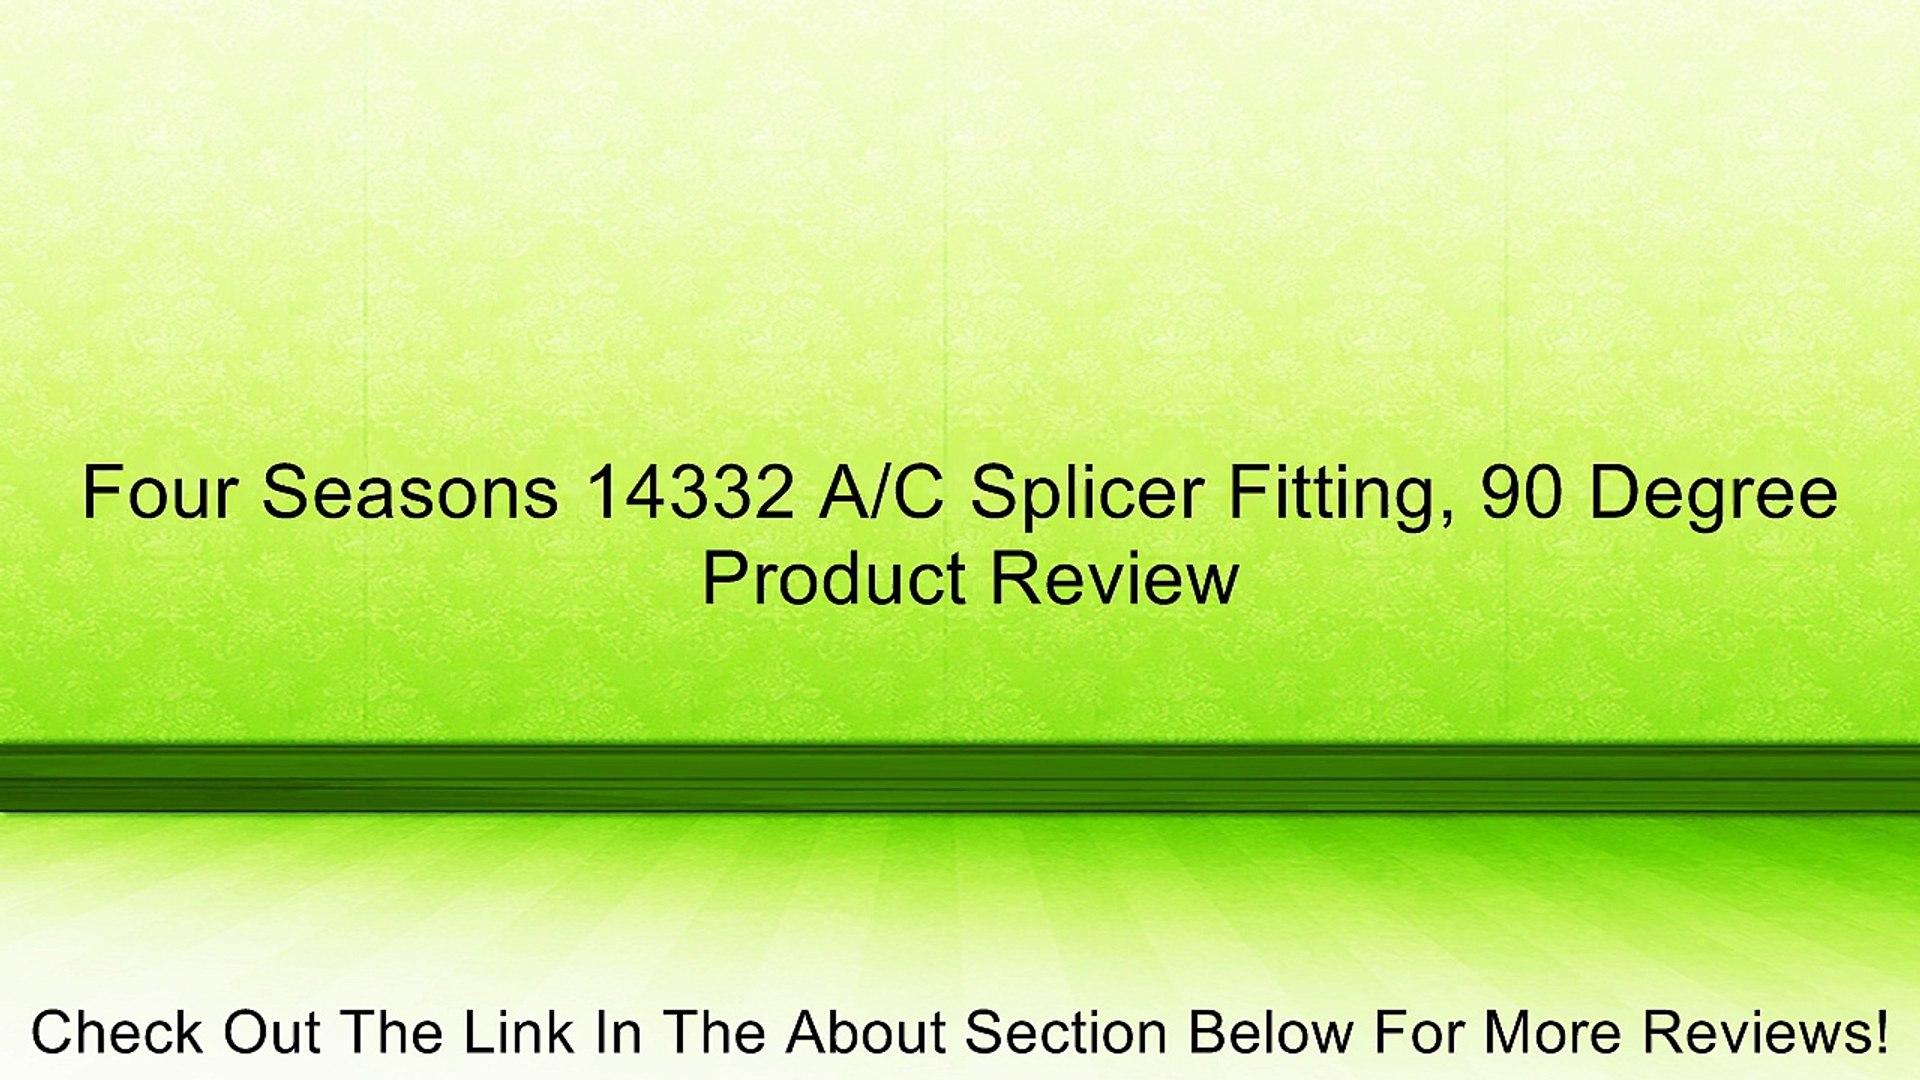 Four Seasons 14332 A//C Splicer Fitting 90 Degree